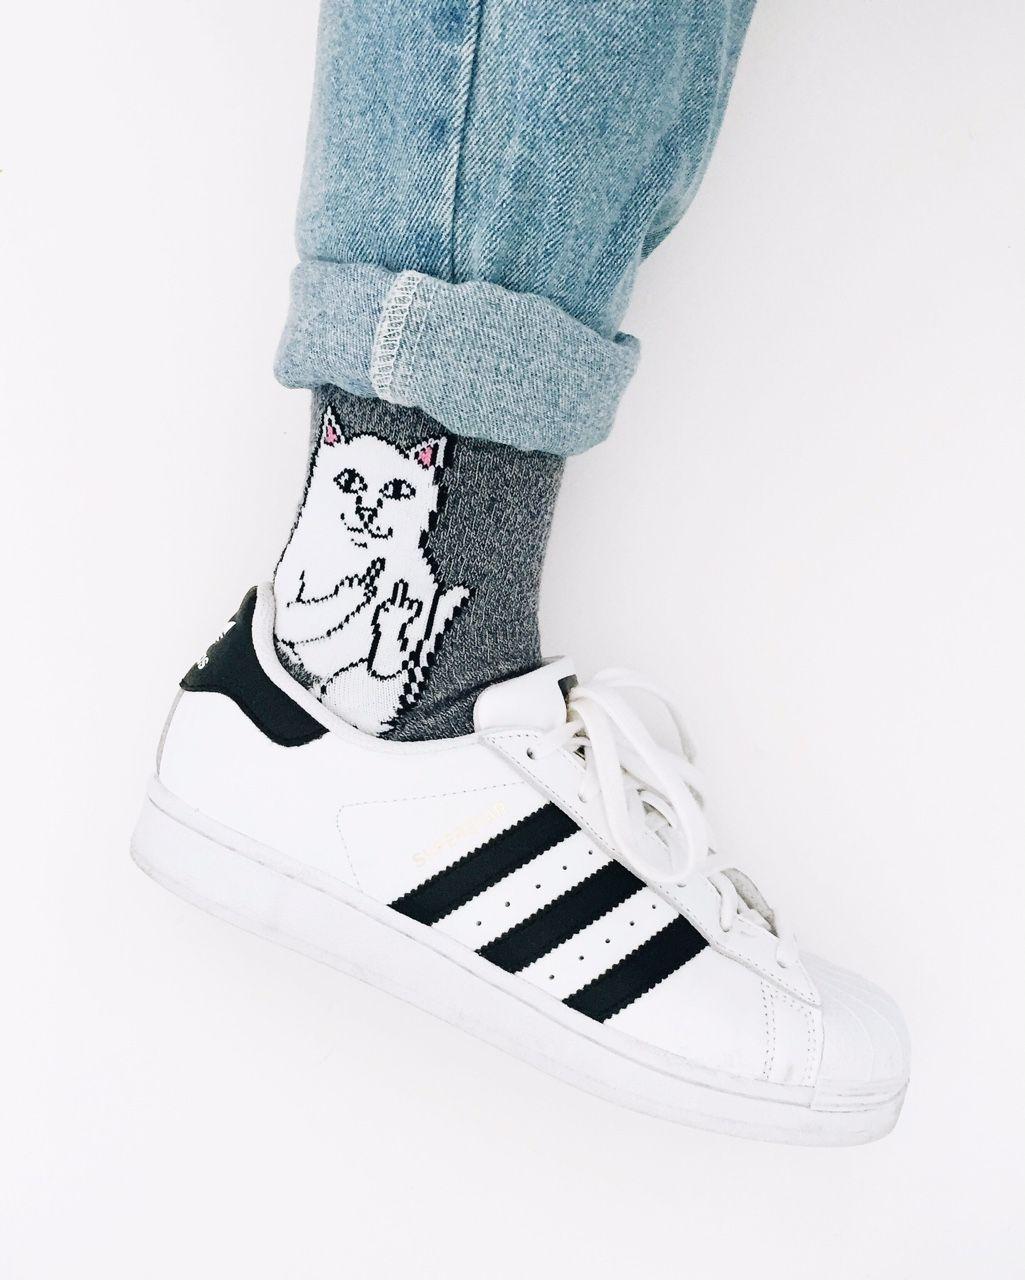 ripndiplivefeed: ripndip socks | Fashion_Moda in 2019